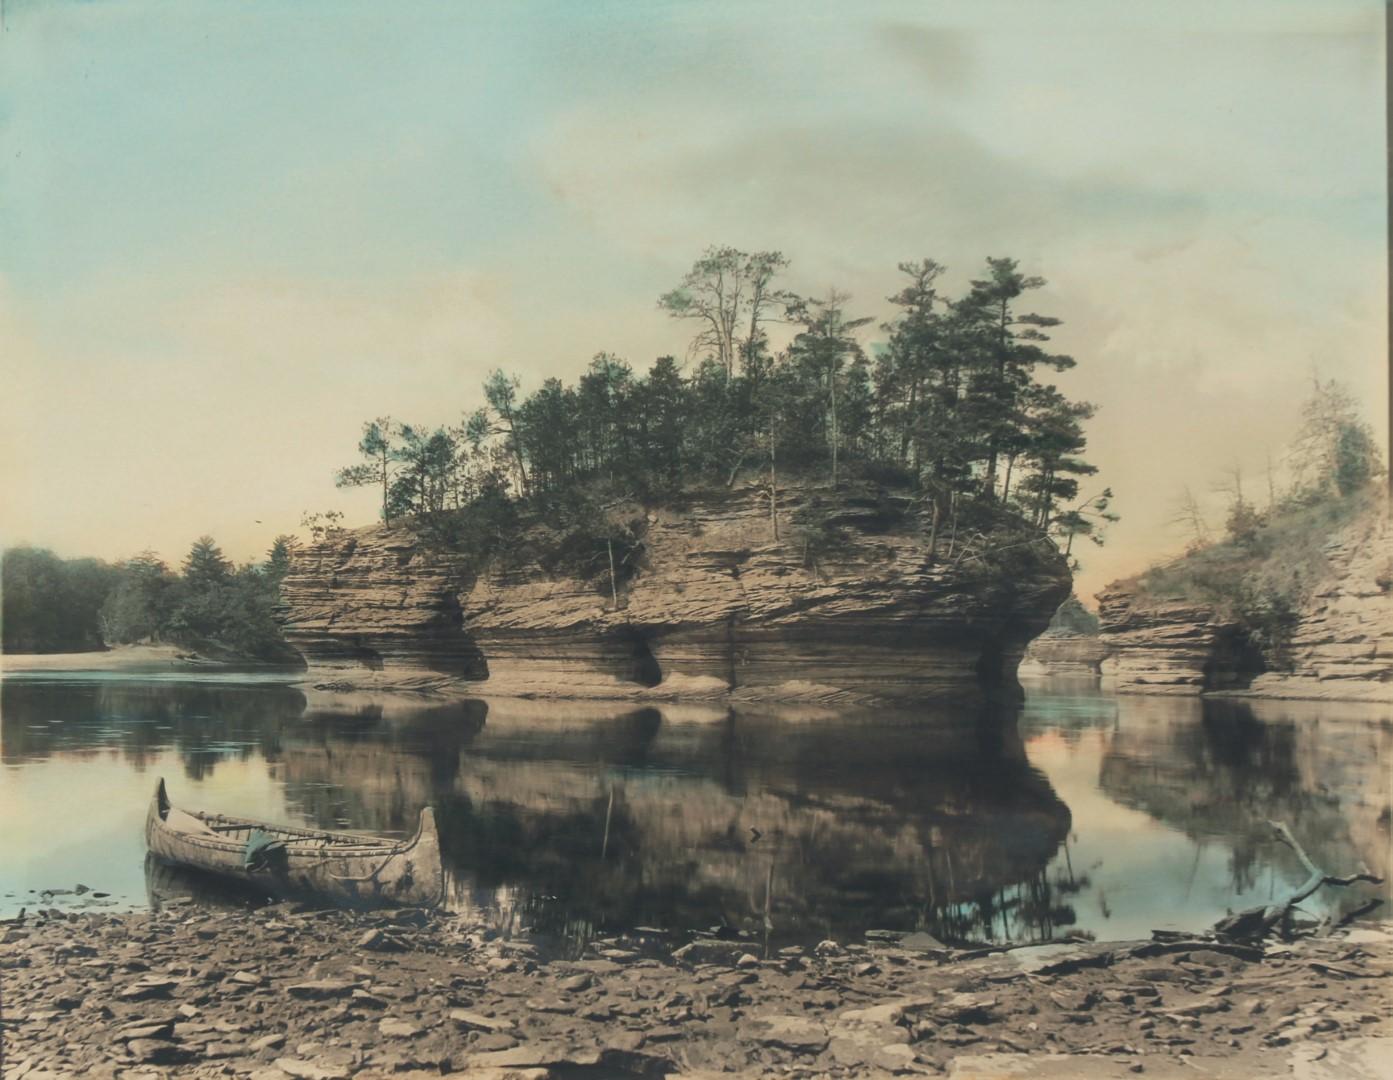 Lone Rock with Canoe, ca. 1900